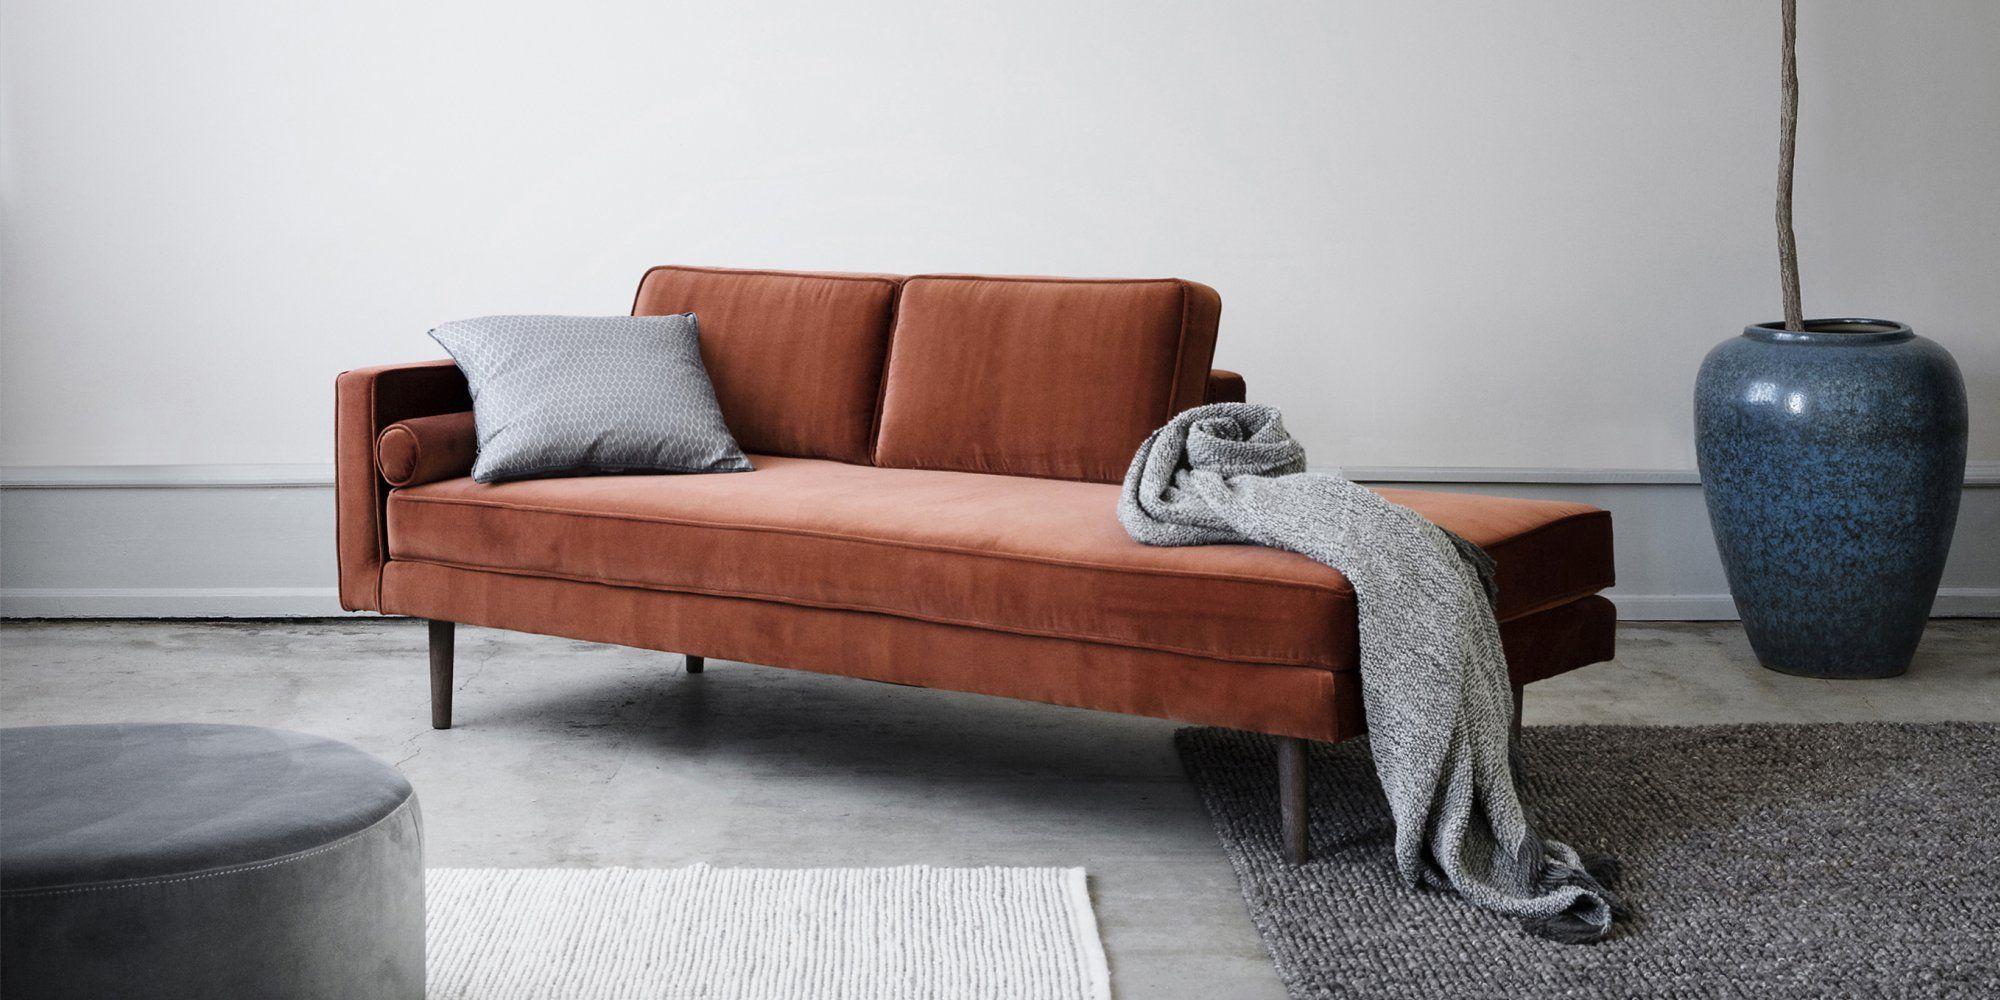 modern living room decor ashley furniture homestore http www kenisahome com blog